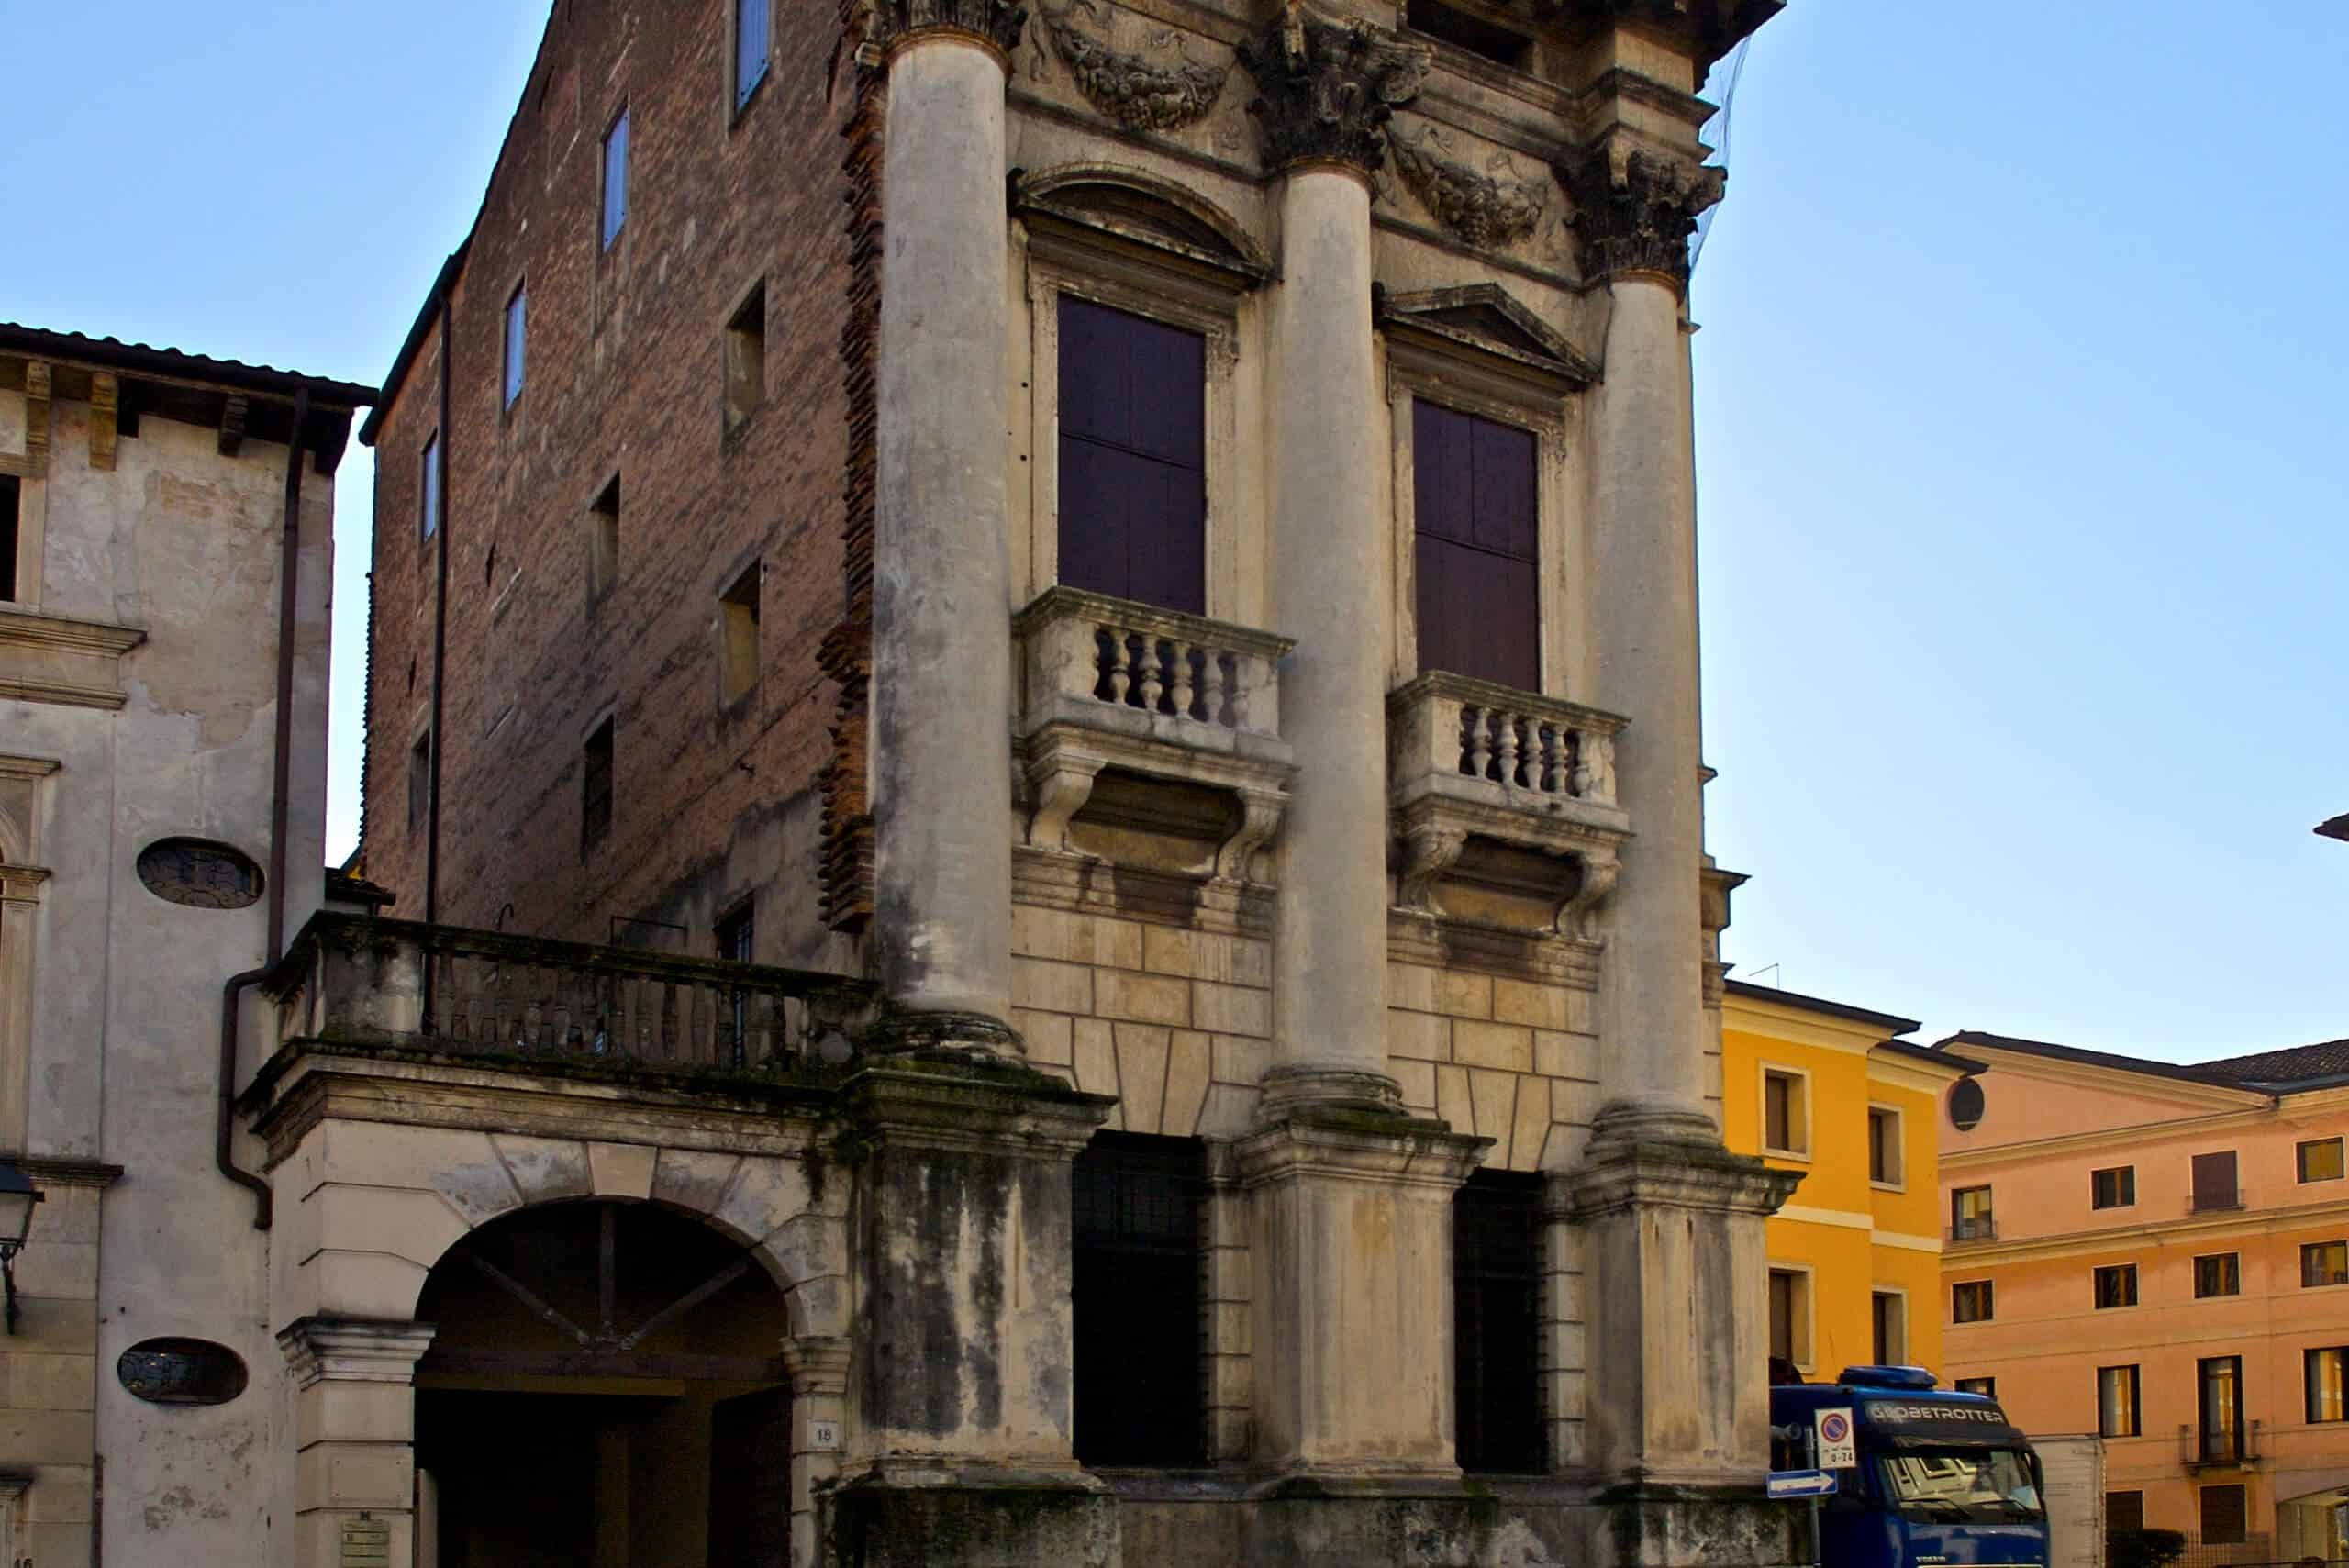 Central Sicaf - Vicenza, Piazza Castello